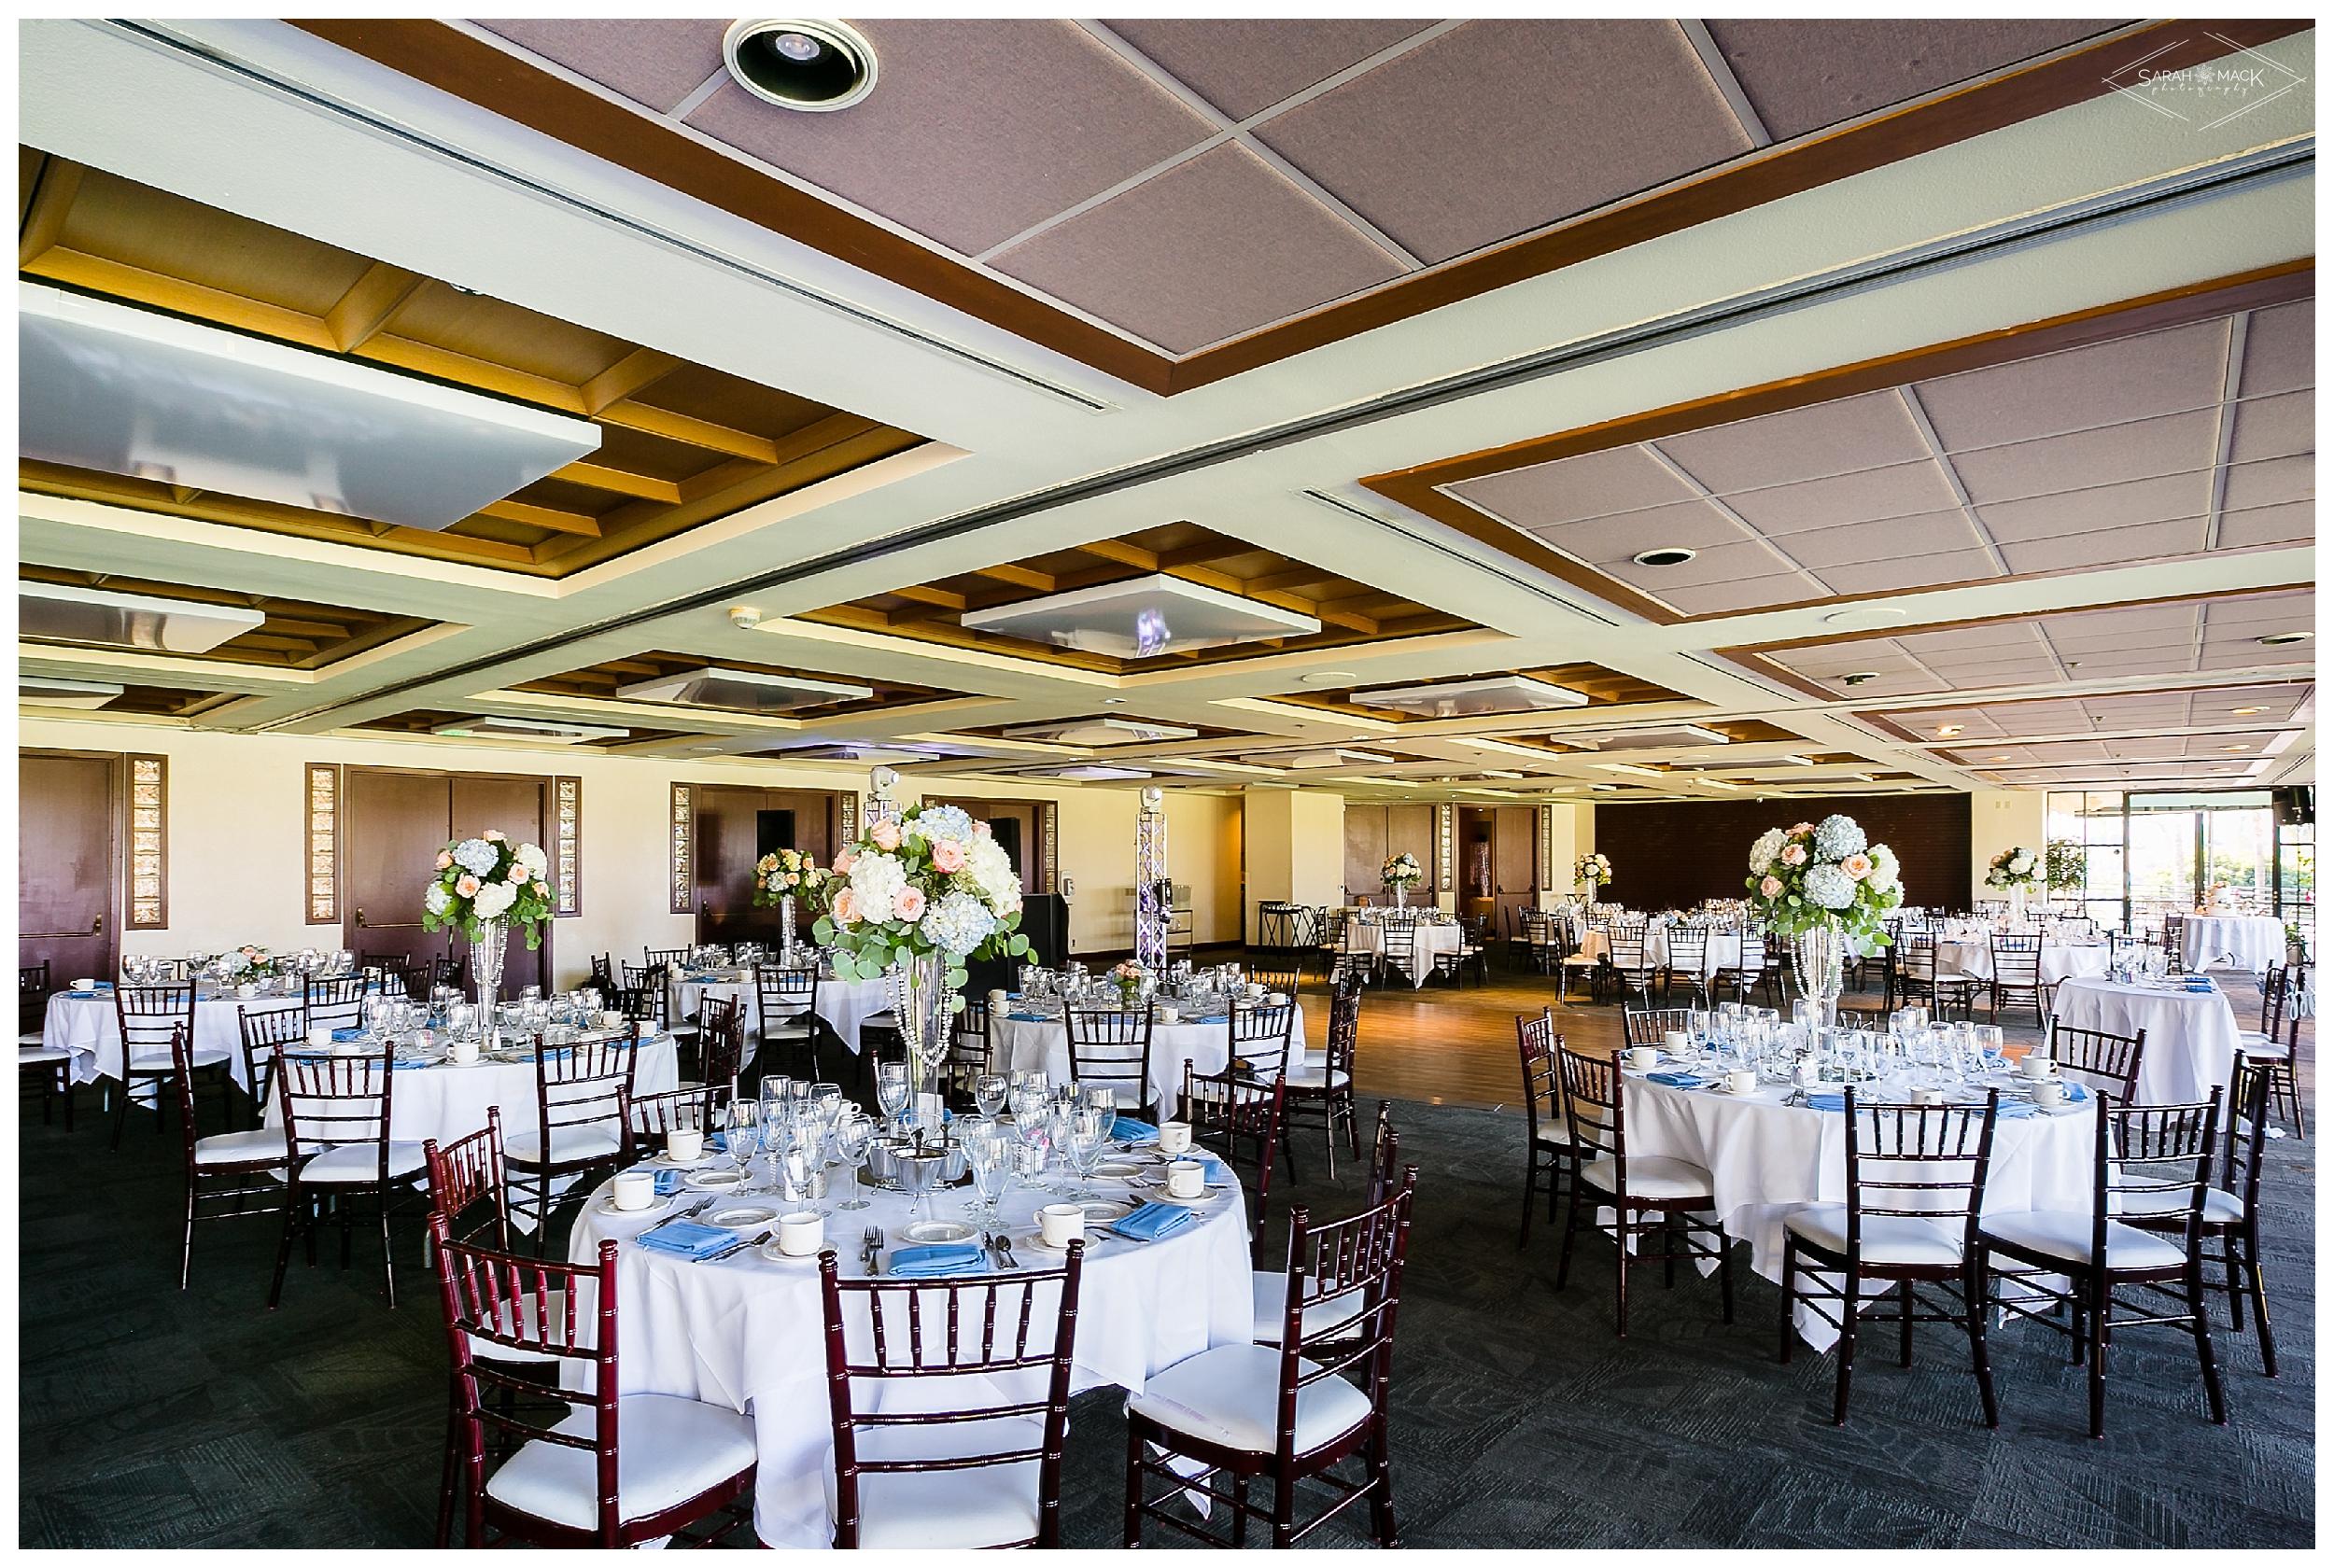 IA-Alta-Vista-Country-Club-Yorba-Linda-Wedding-Photography 427.jpg